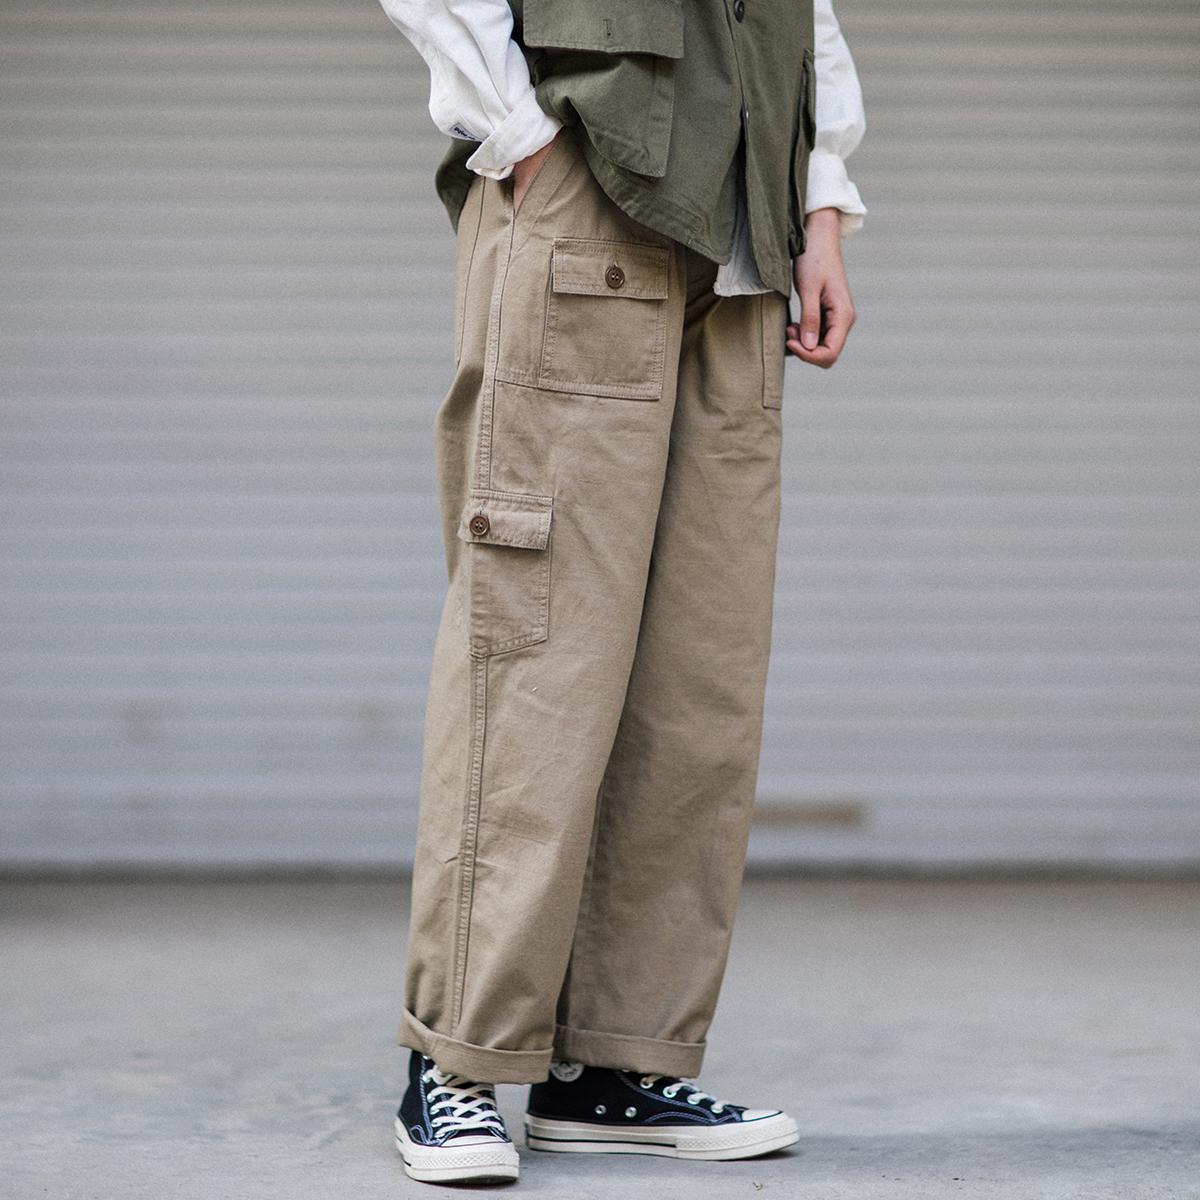 BF  男女同款宽松休闲裤 风中姓直筒工装裤 Epicsocotra 美式阿美咔叽